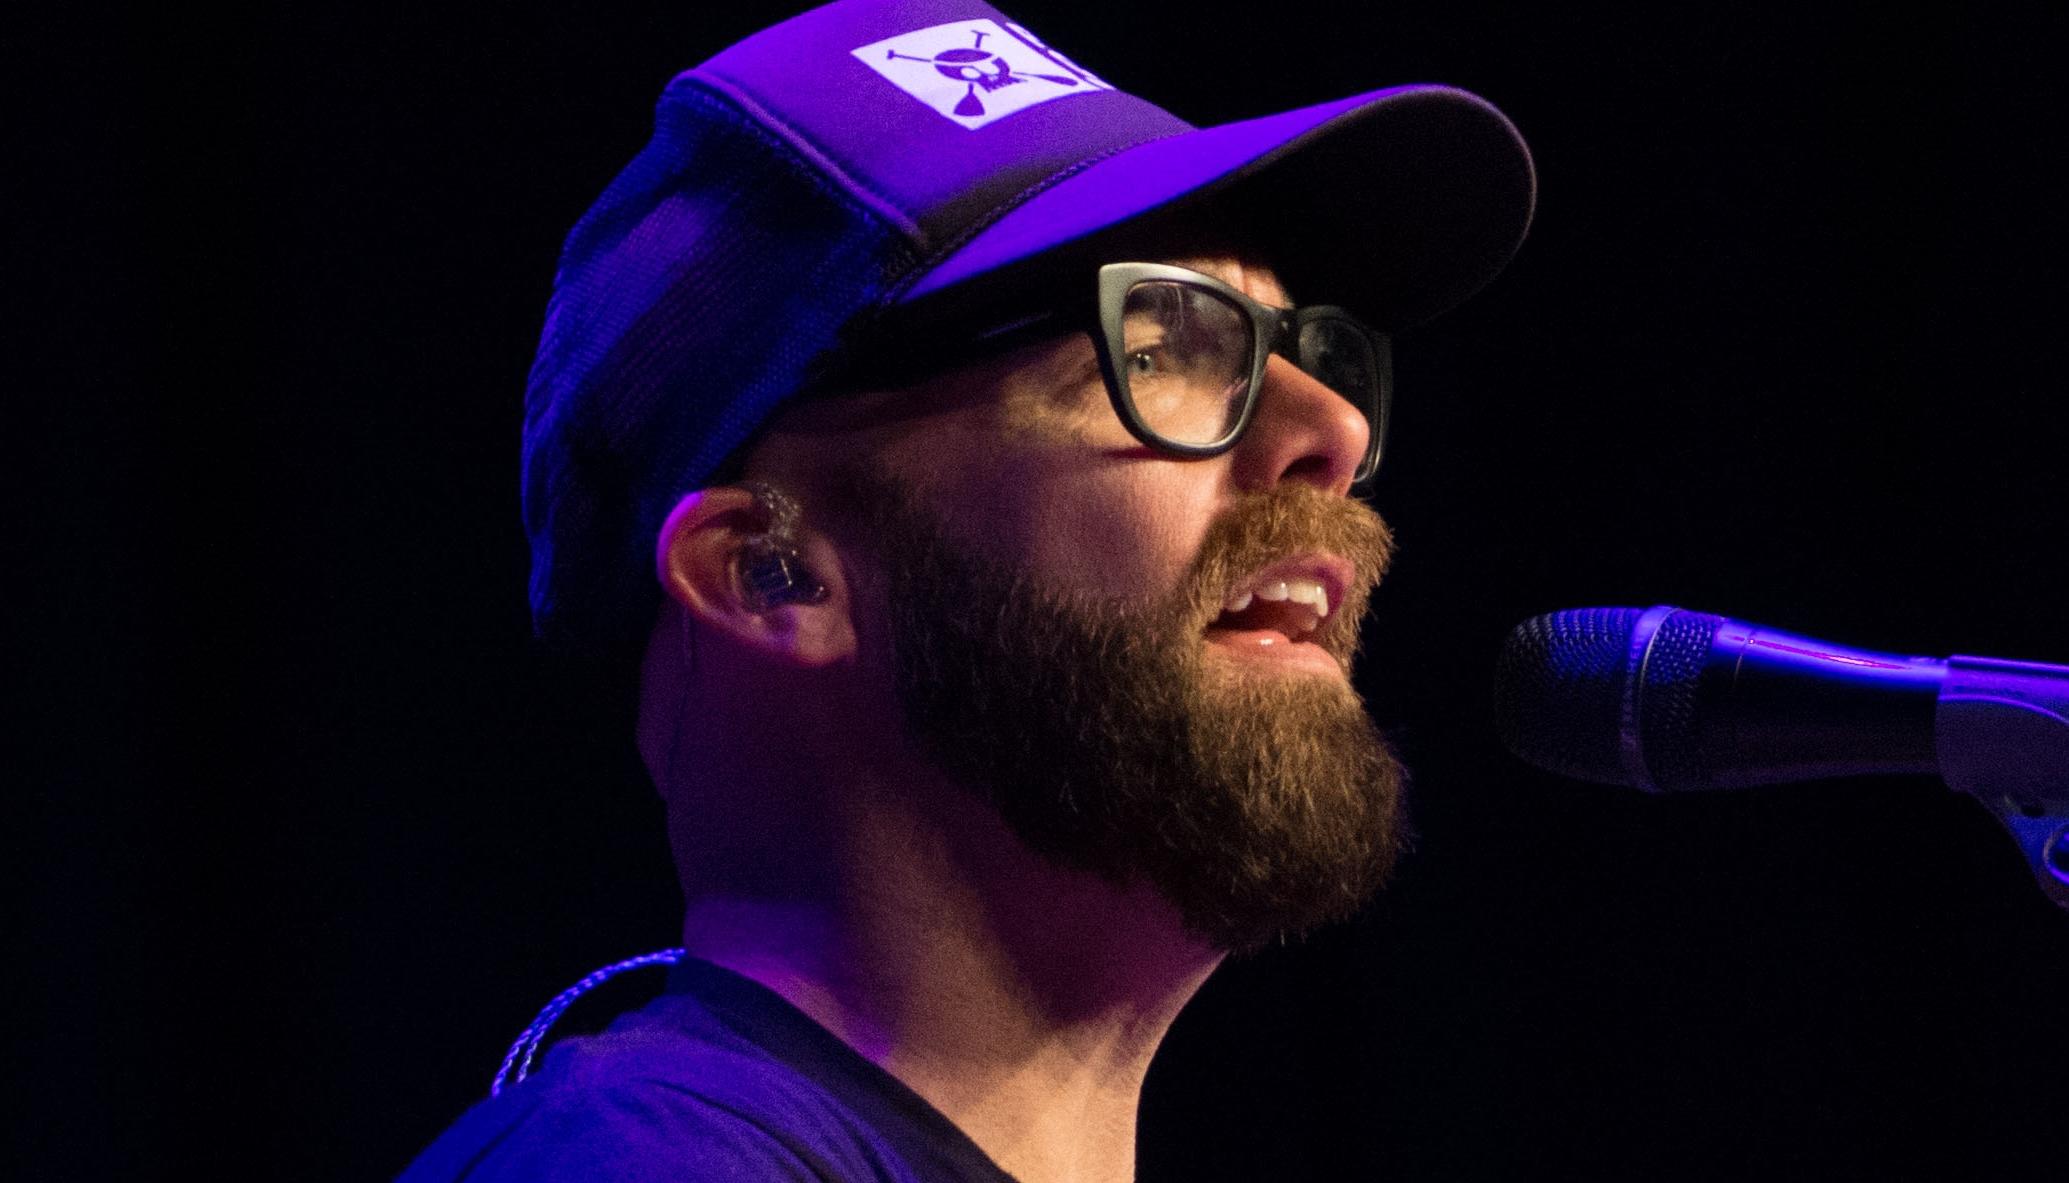 Tim Timmons (musician) - Wikipedia